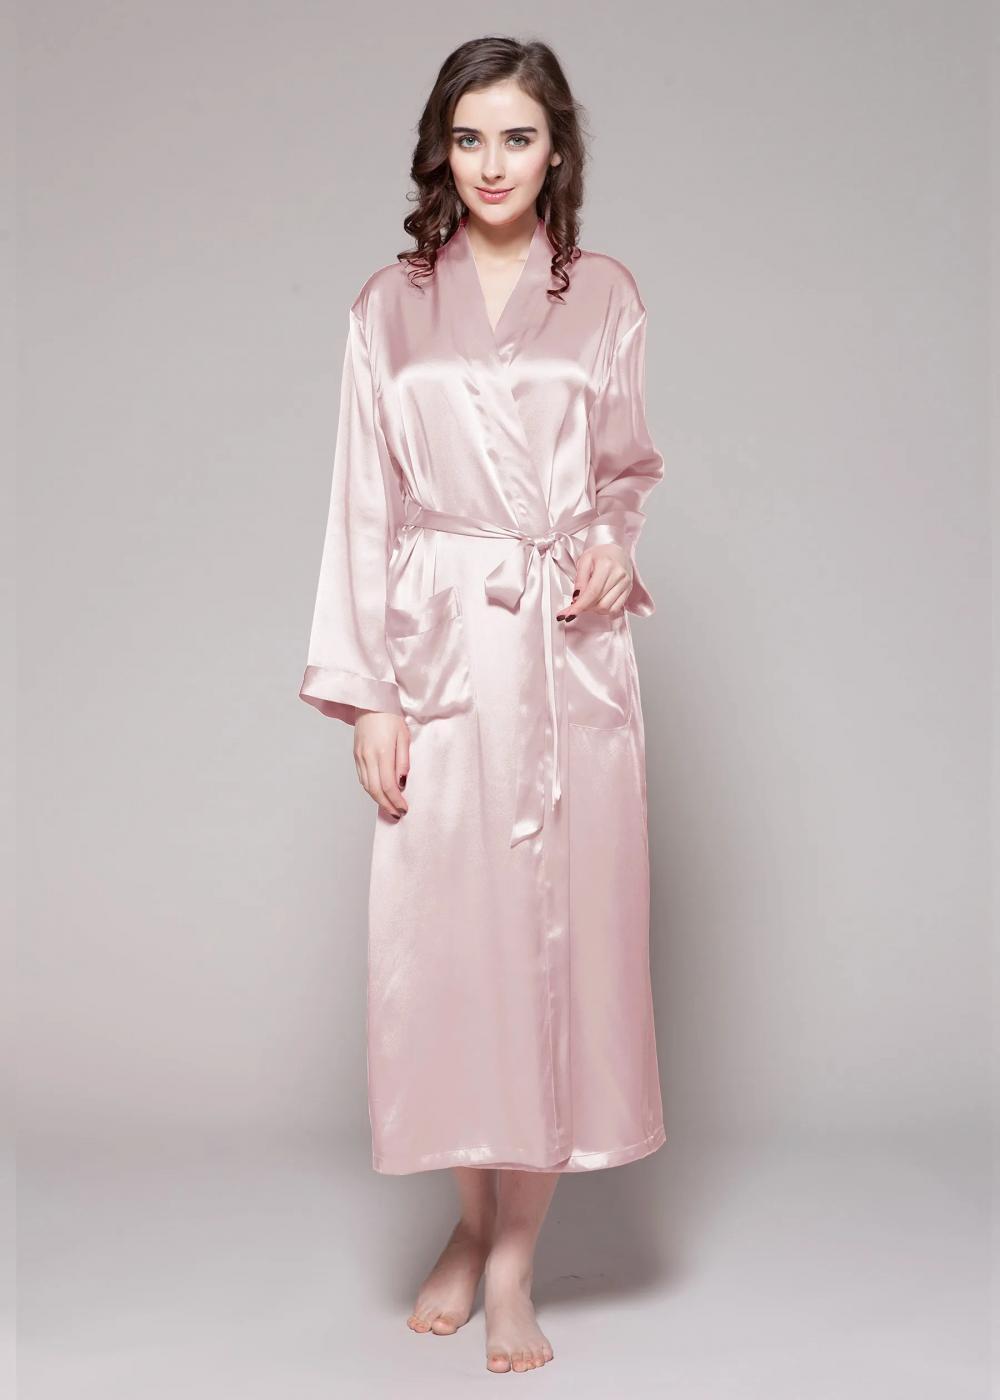 Rosy Pink 1 Jpg